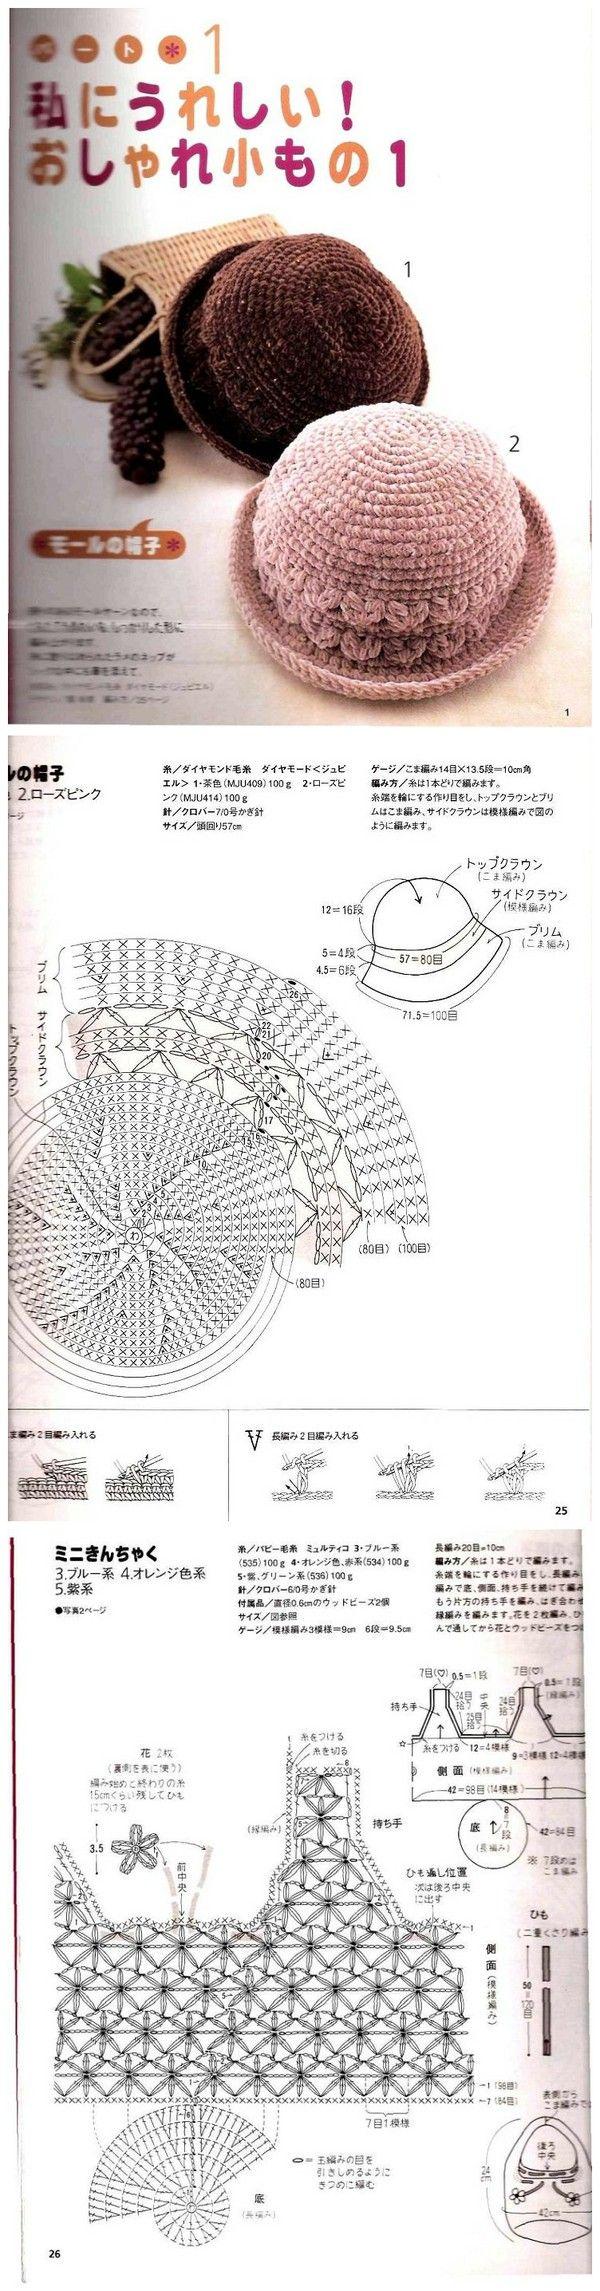 228 best gorros y sombreros images on Pinterest | Crochet hats ...